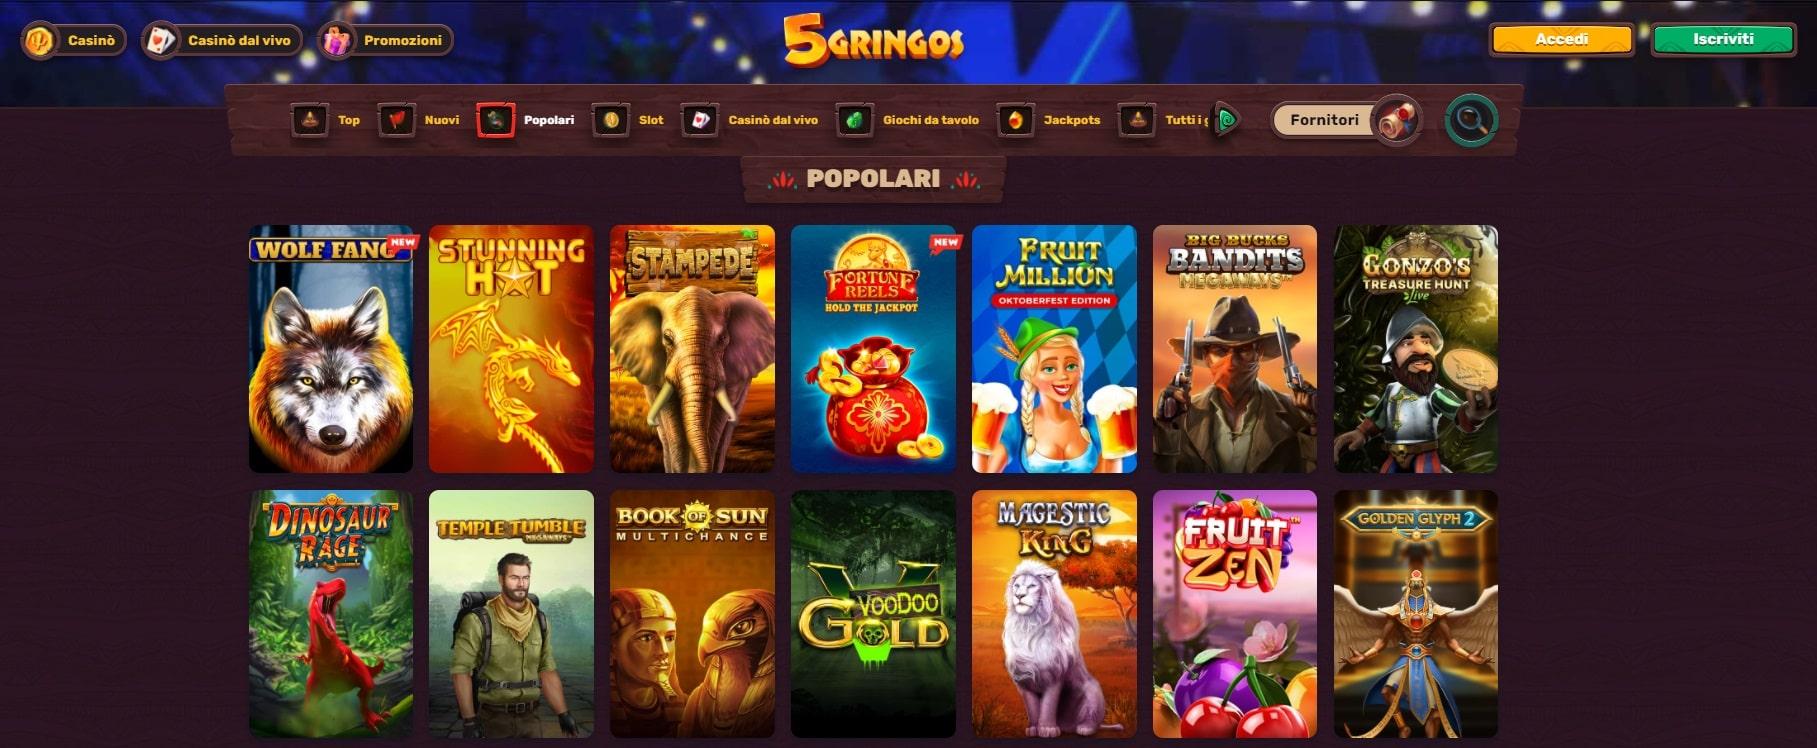 giochi casinò online 5 gringos